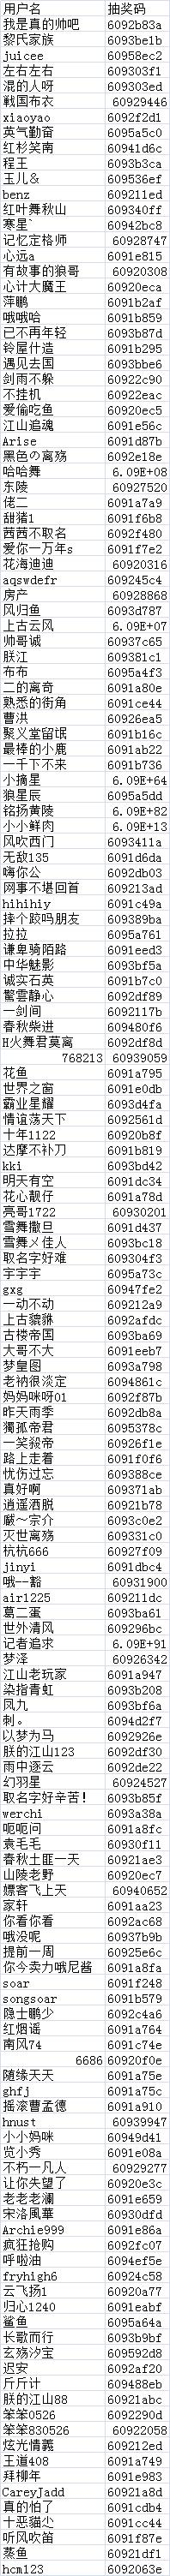 5-13 江山.png